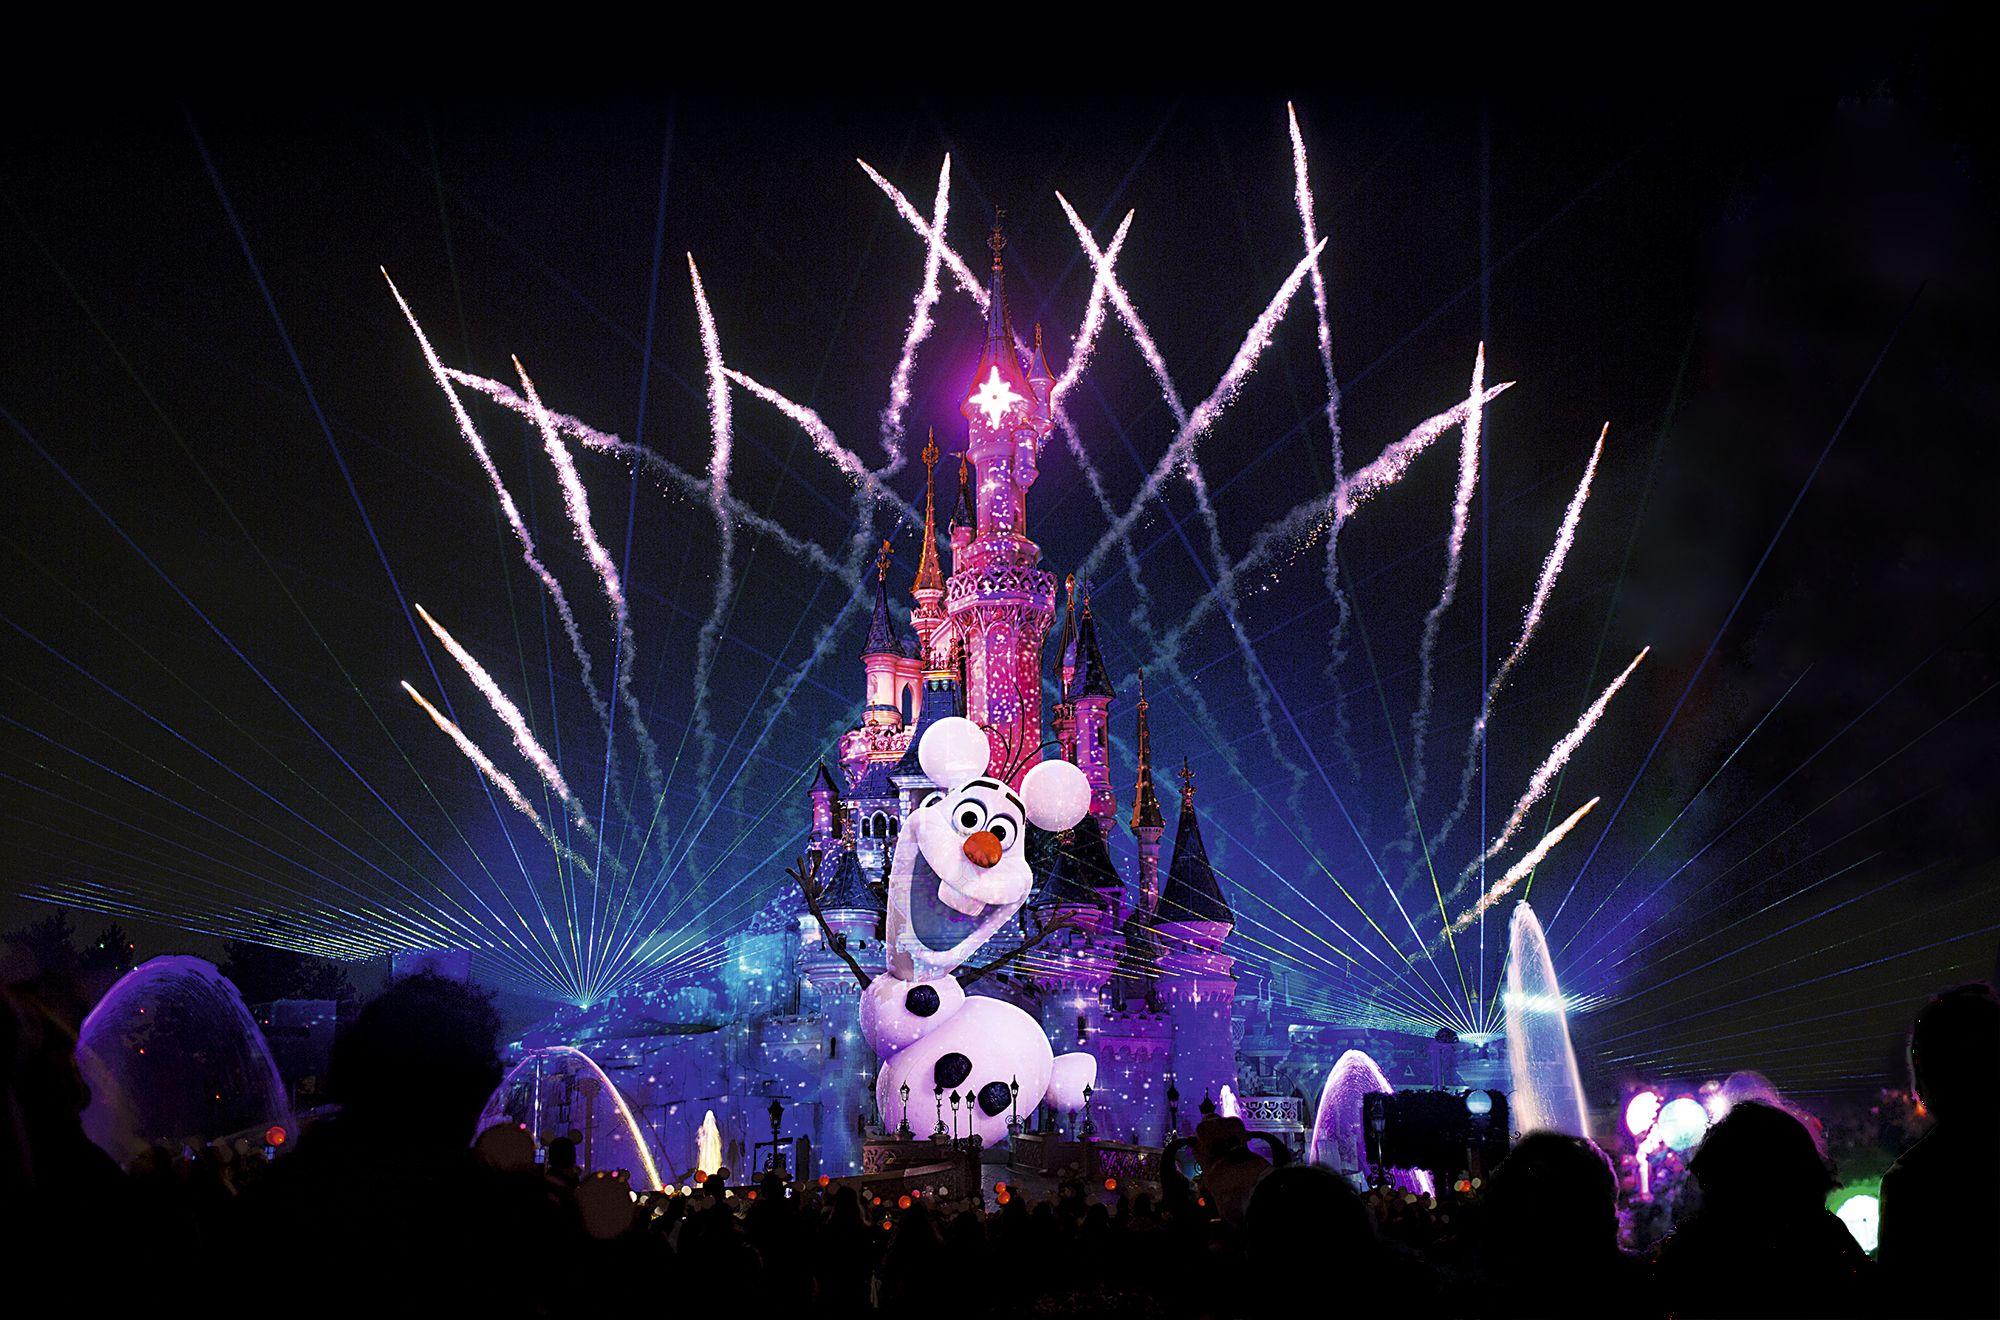 Frozen Summer Fun at Disneyland Paris Disney Dreams Fireworks Display